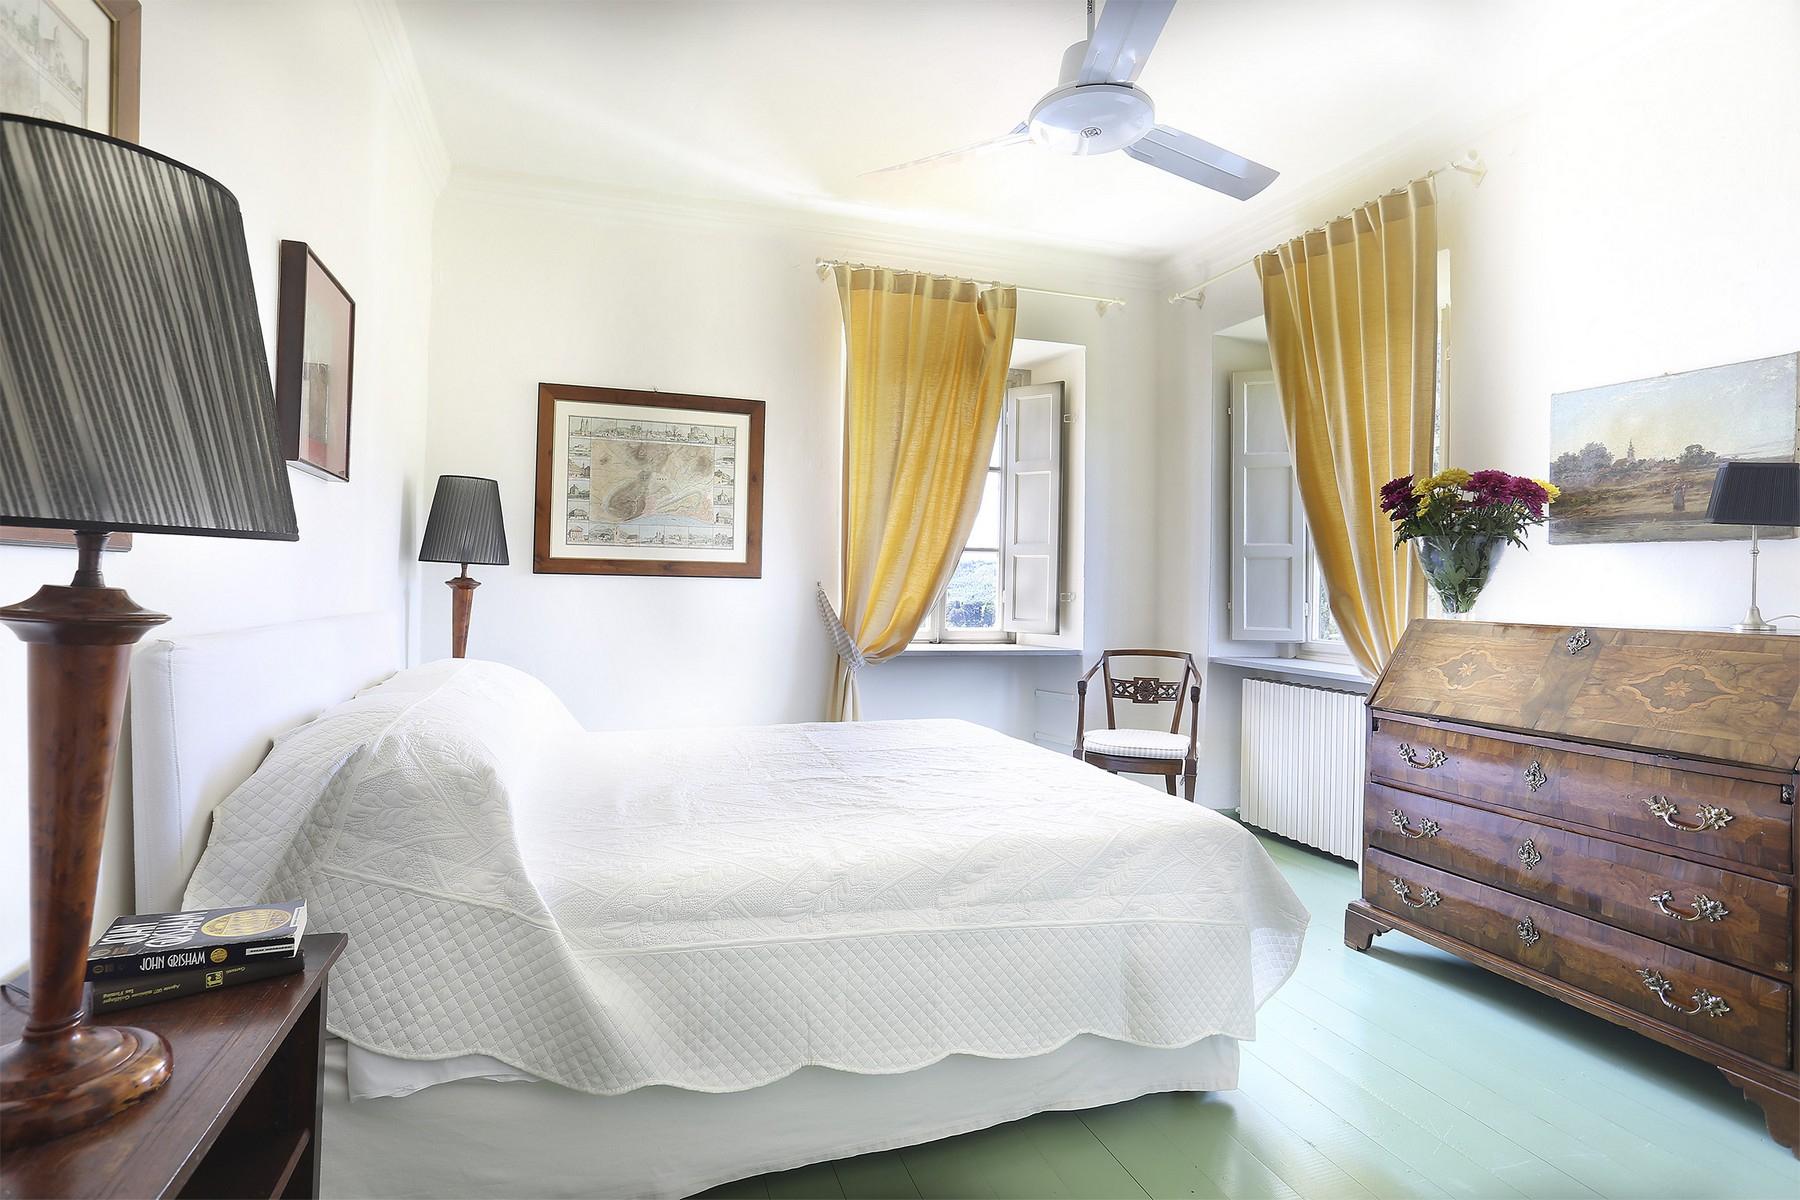 Villa in Vendita a Lucca: 5 locali, 735 mq - Foto 14